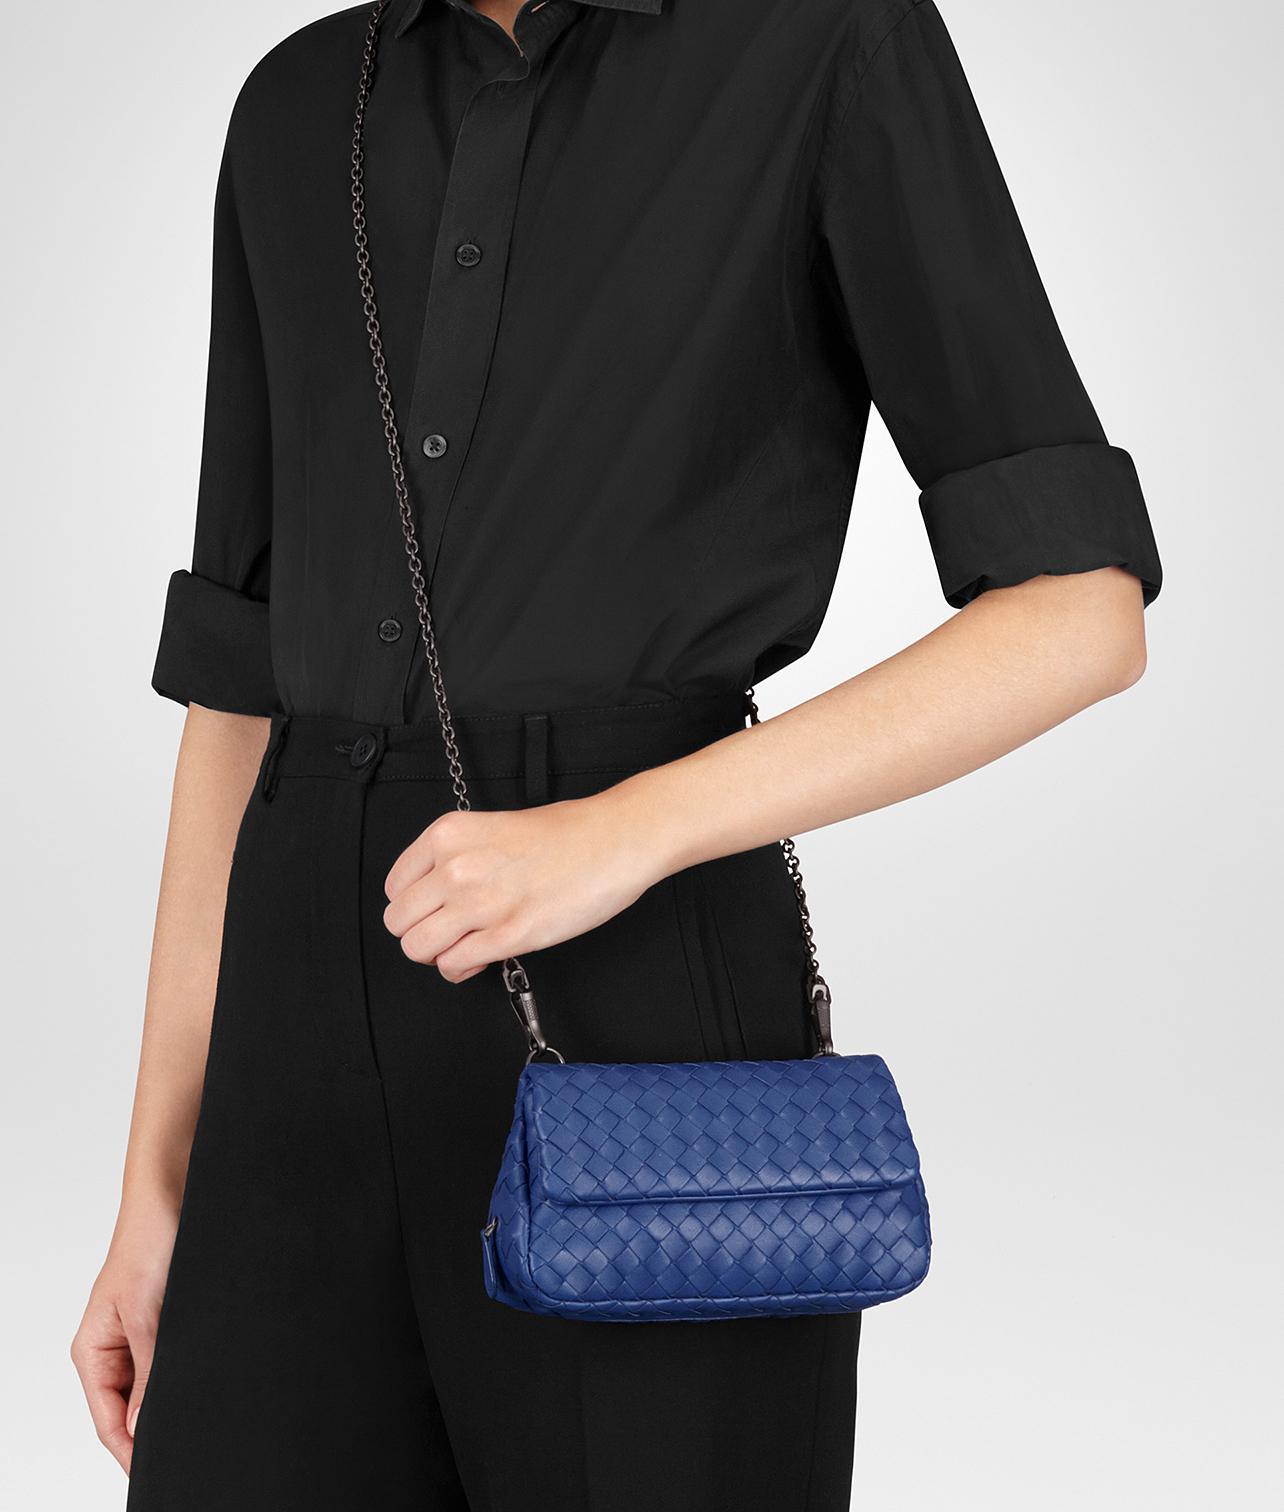 72386603748c Lyst - Bottega Veneta Cobalt Intrecciato Nappa Mini Messenger Bag in ...